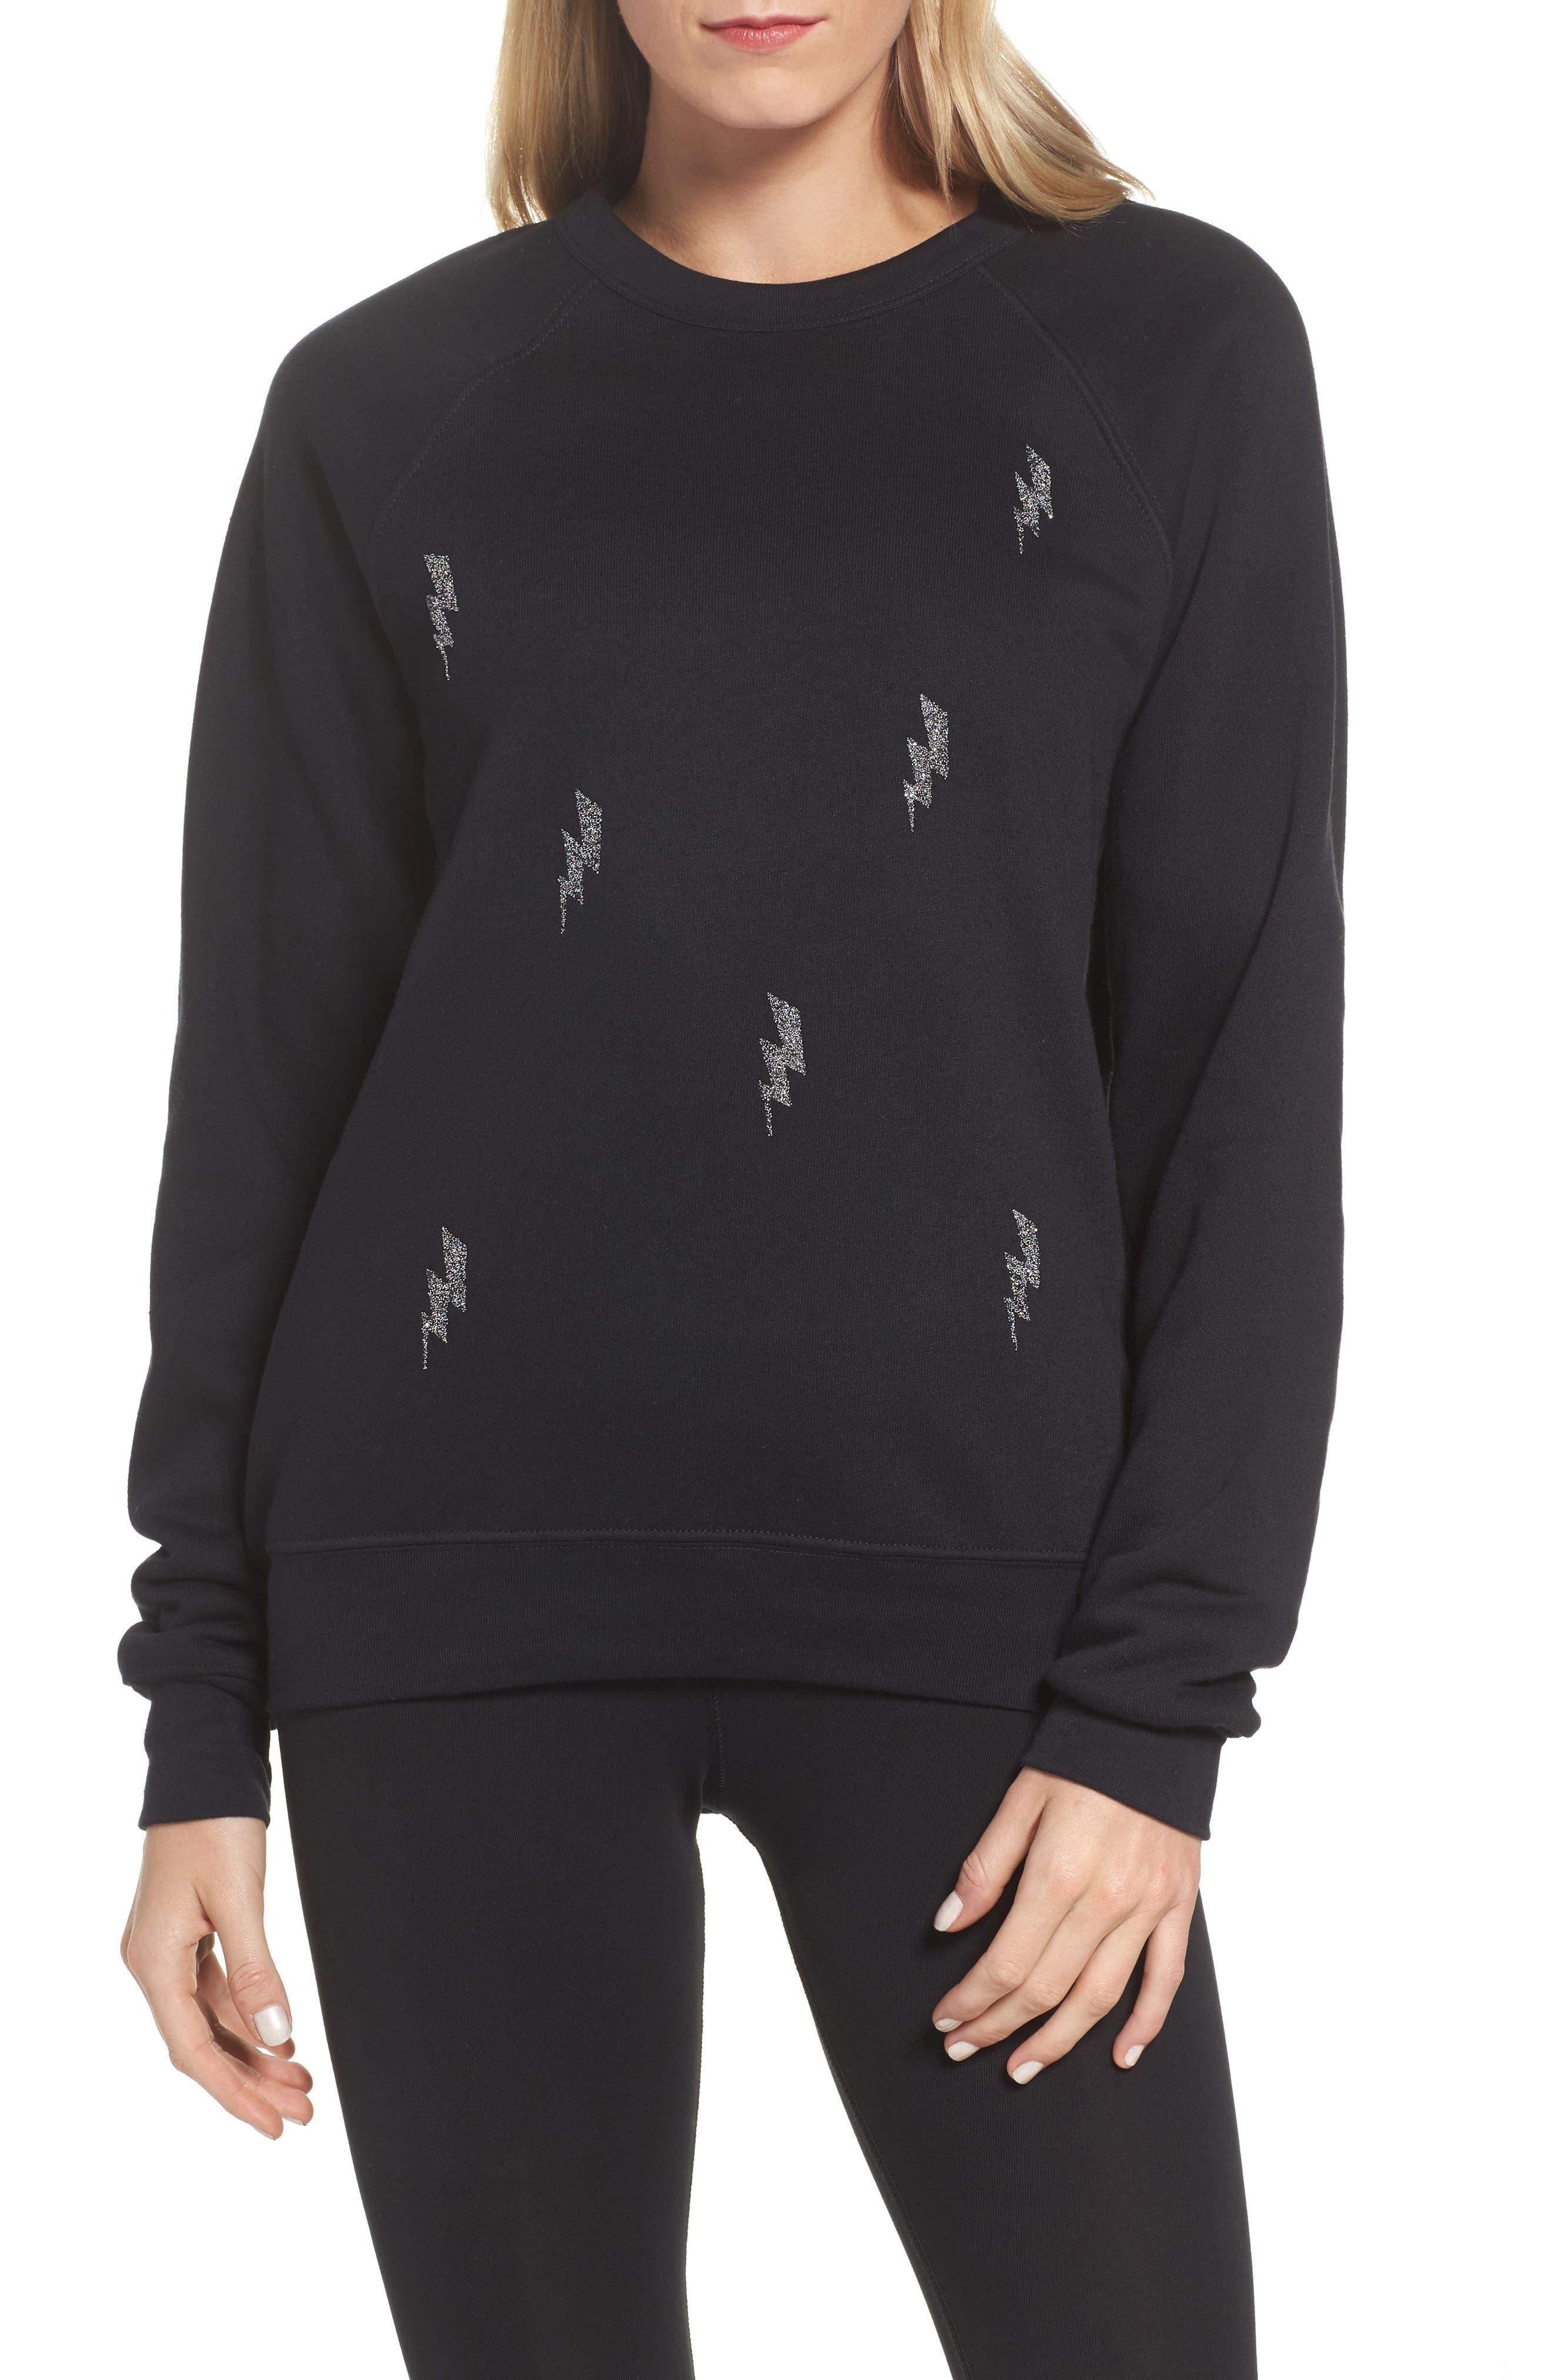 Swarovski Bolt Sweatshirt,                         Main,                         color,